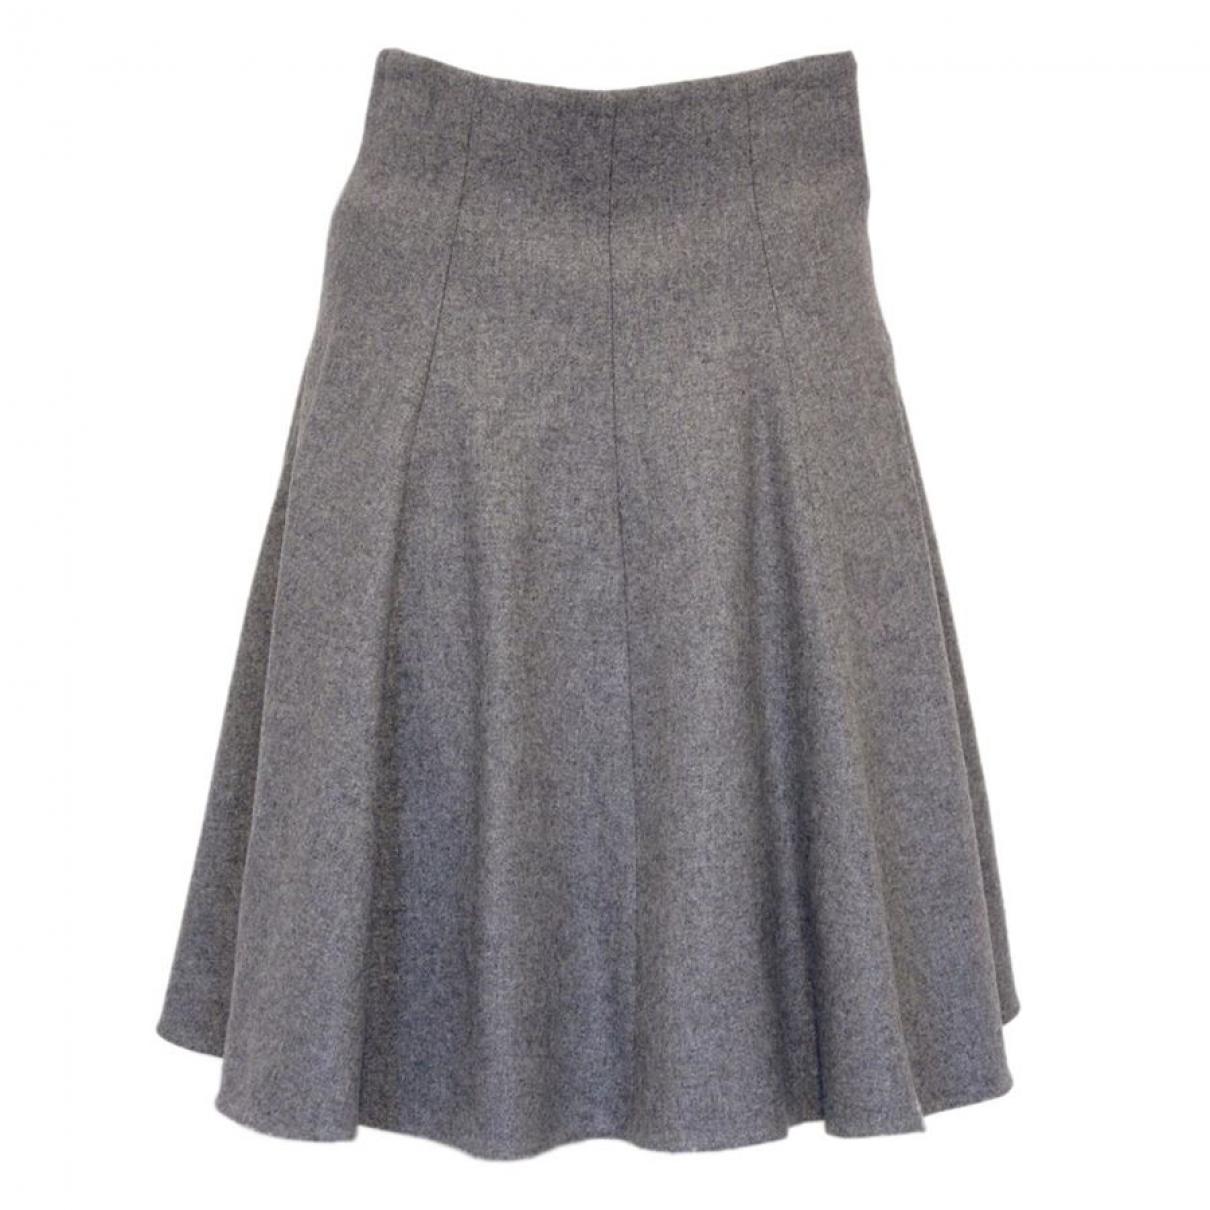 Dolce & Gabbana \N Grey Wool skirt for Women 36 IT